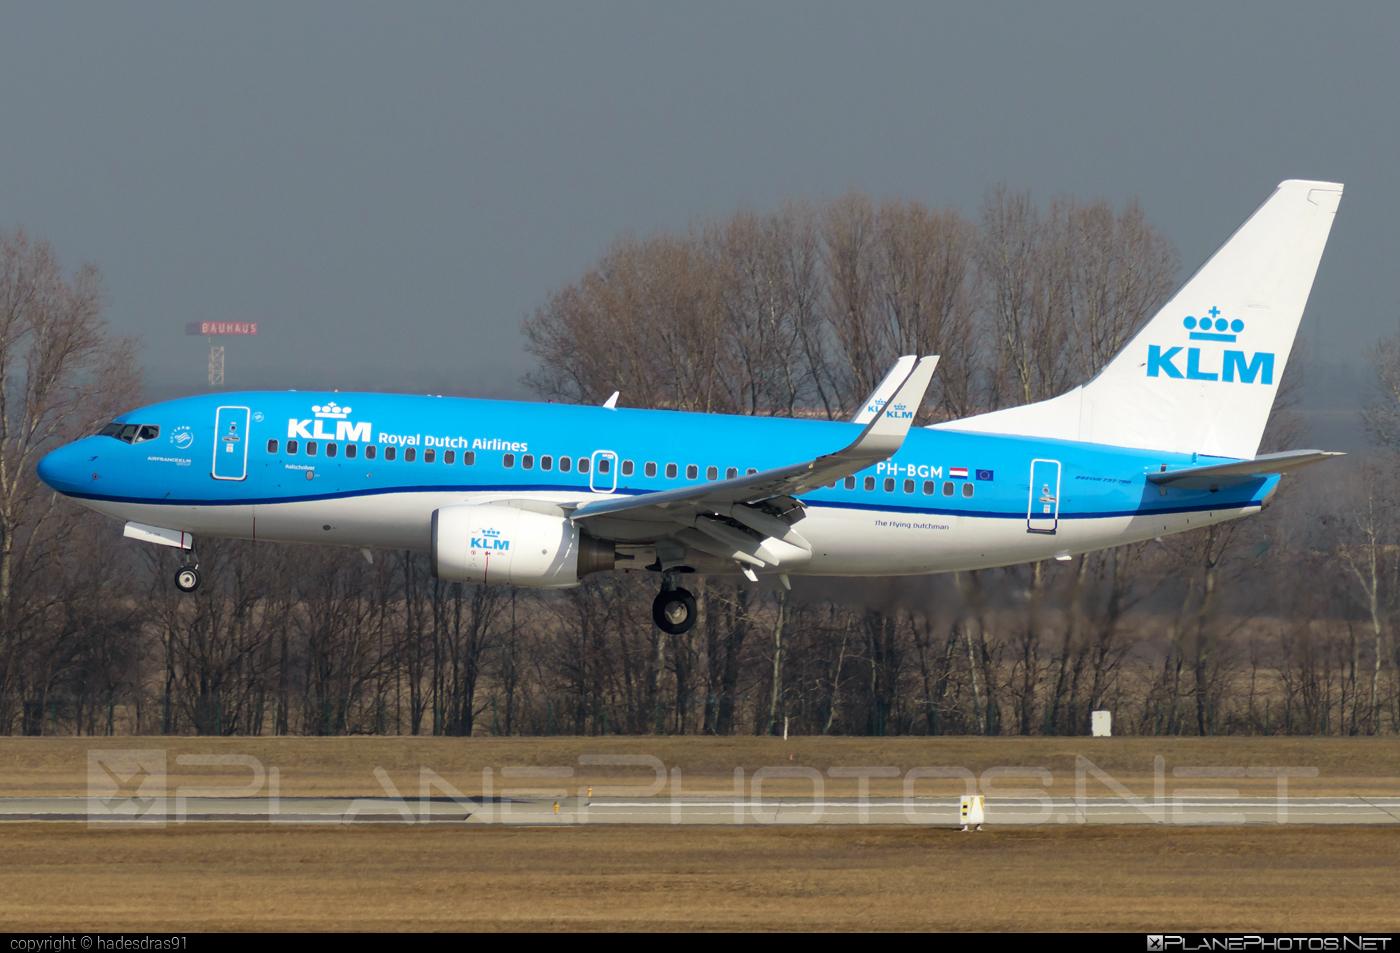 Boeing 737-700 - PH-BGM operated by KLM Royal Dutch Airlines #b737 #b737nextgen #b737ng #boeing #boeing737 #klm #klmroyaldutchairlines #royaldutchairlines